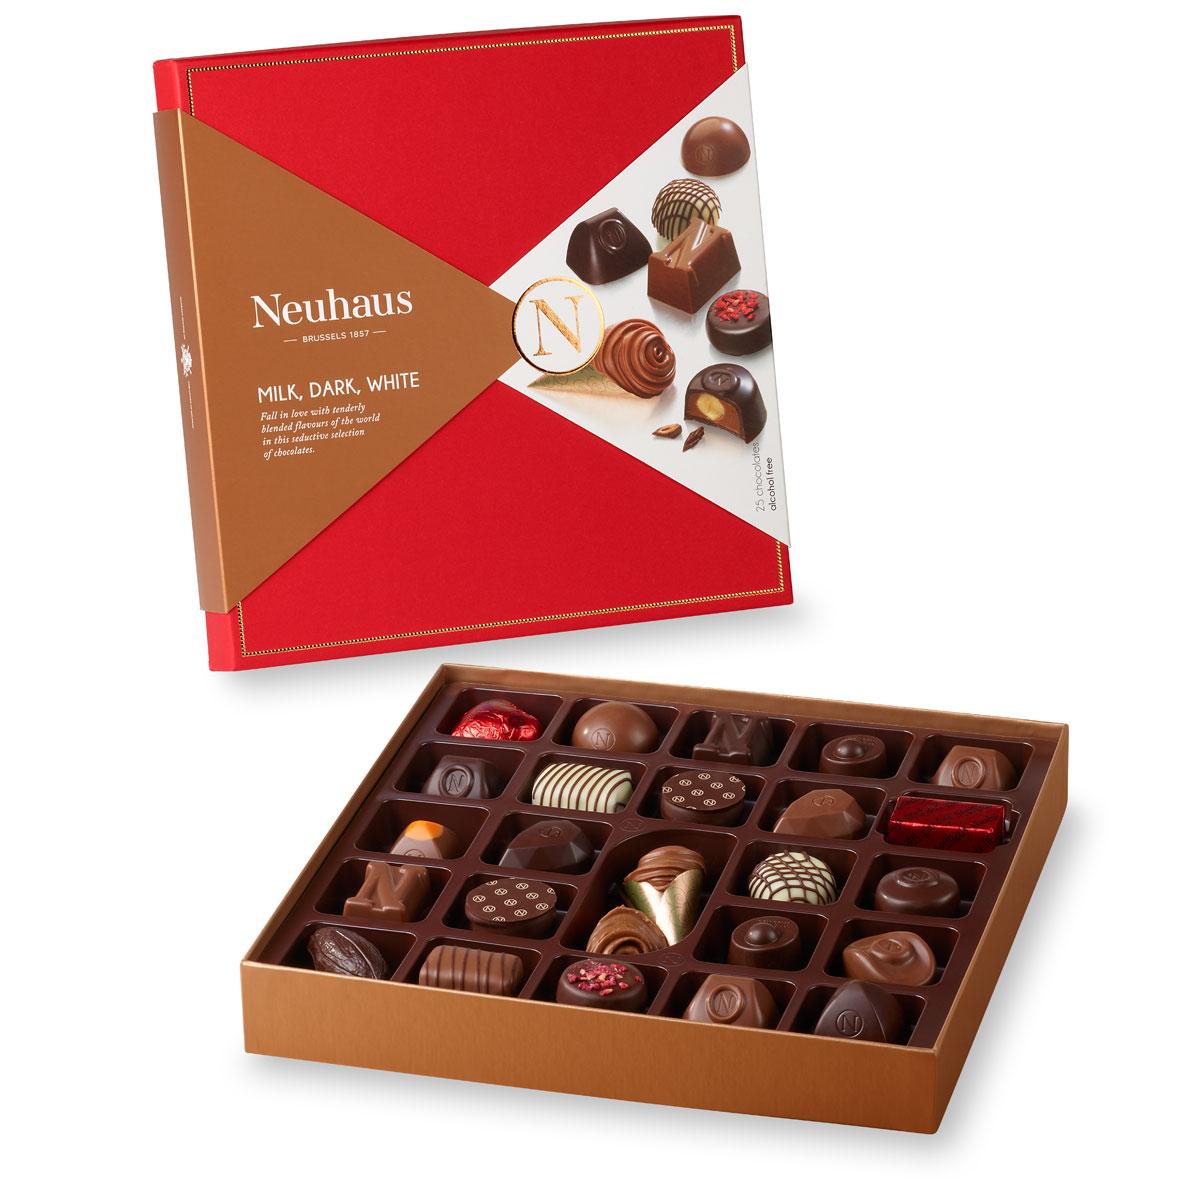 neuhaus chocolate canada delivery neuhaus chocolate delivery canada